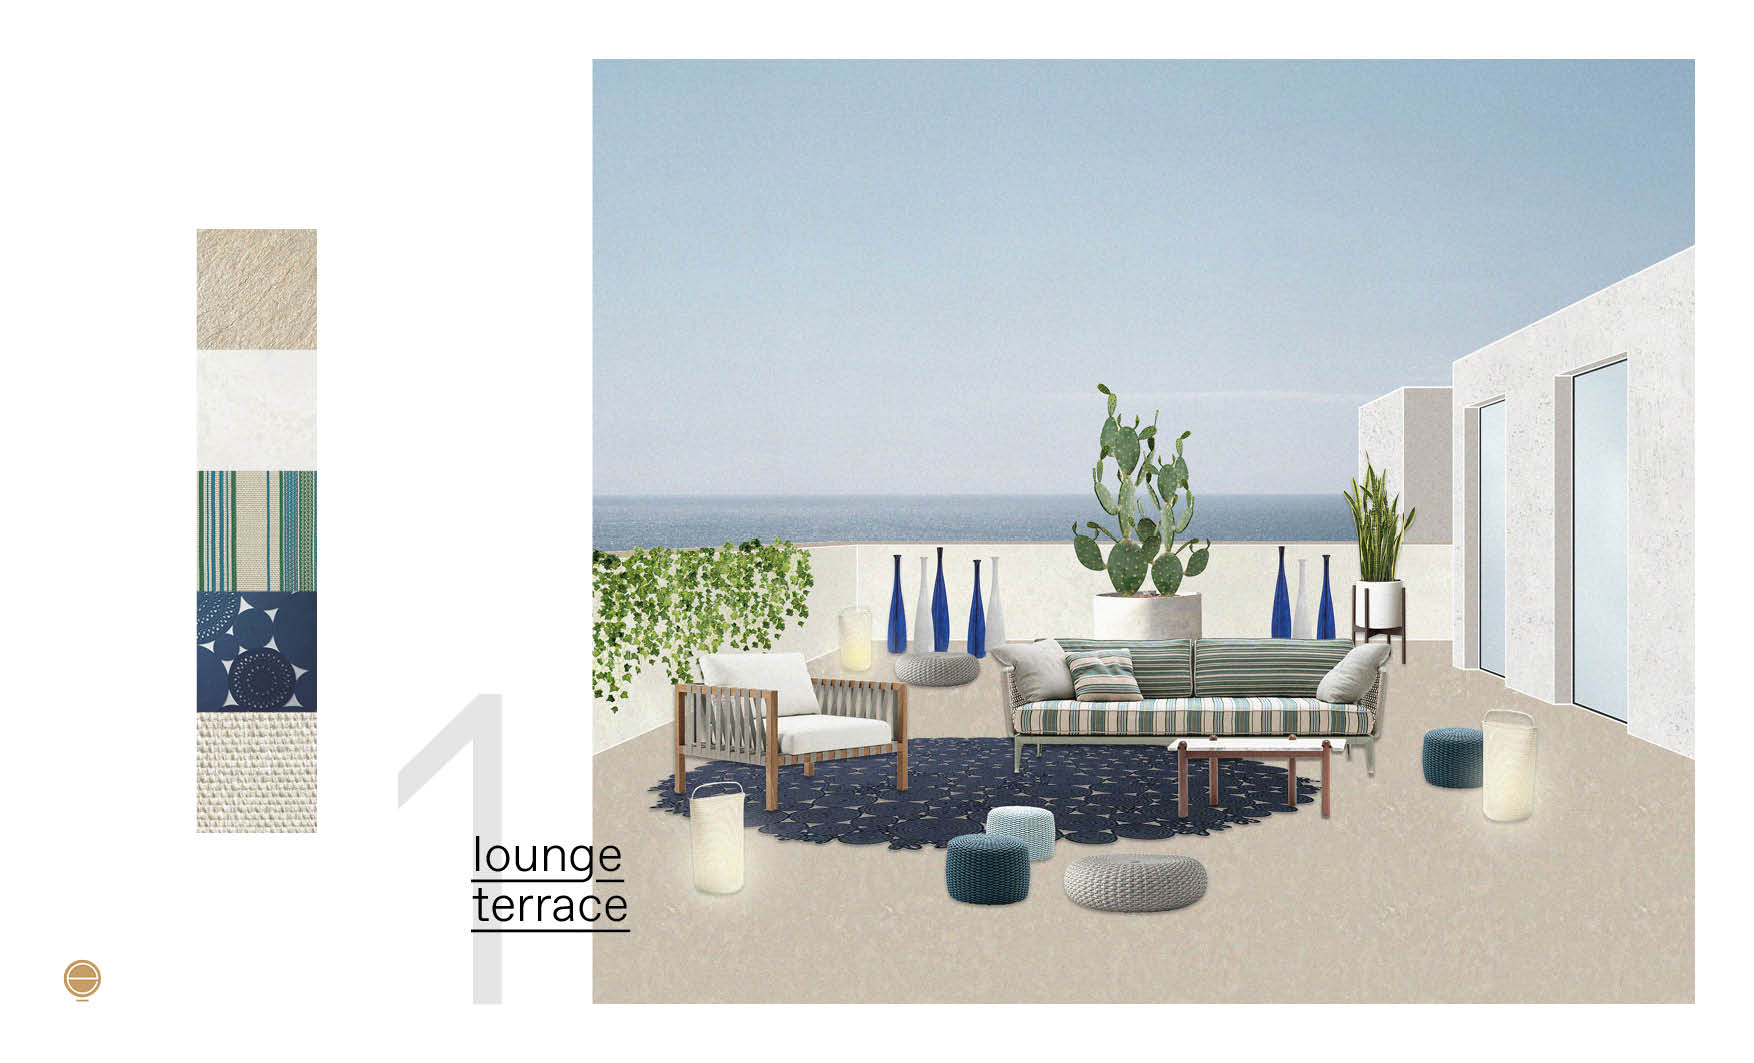 lounge Italian patio design project made by esperiri team